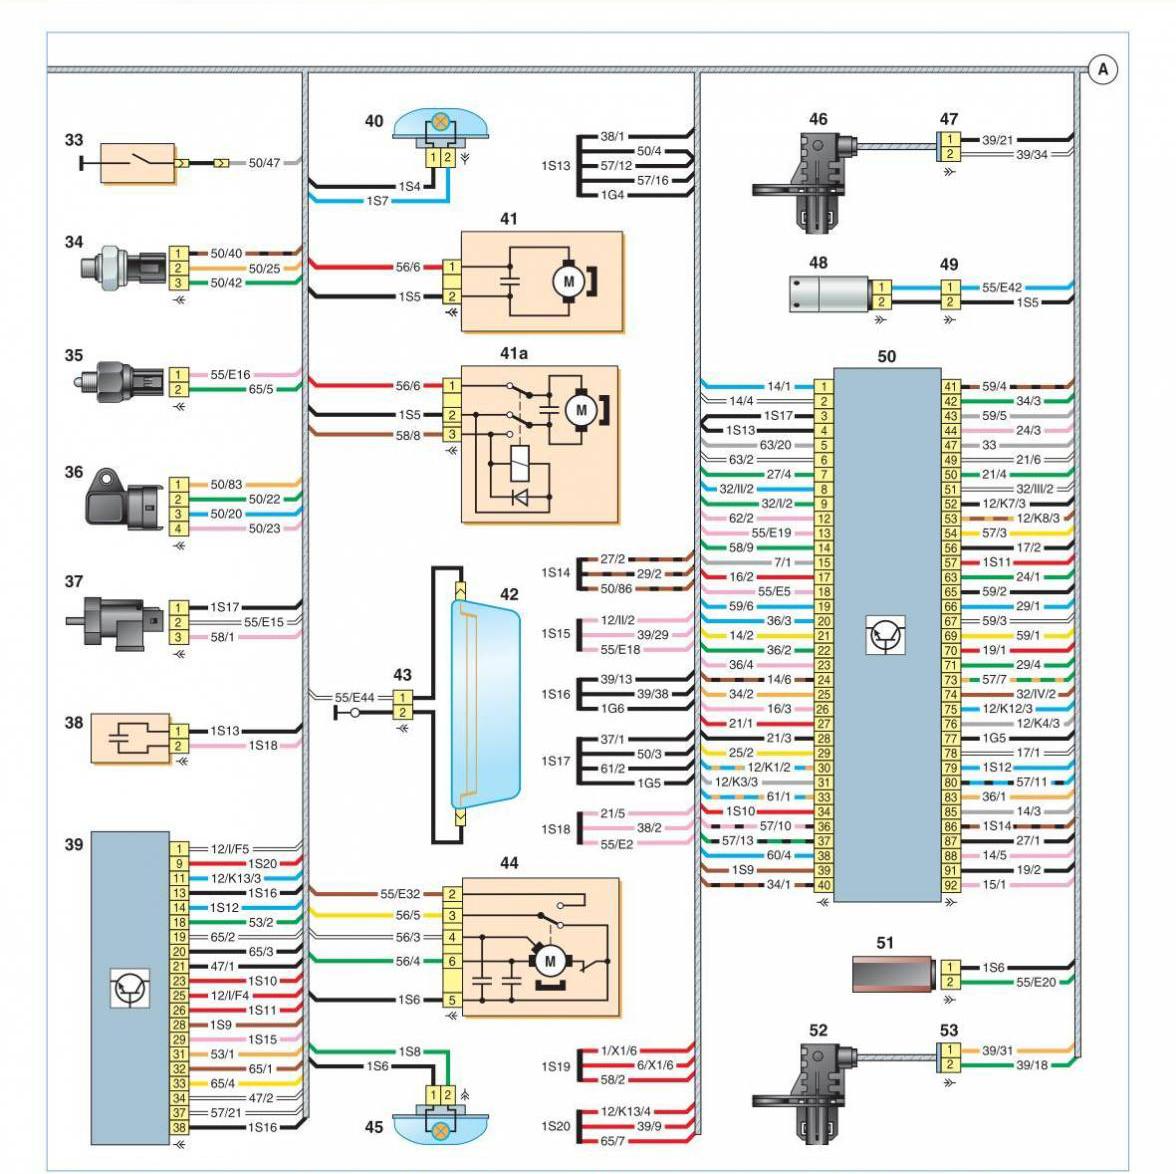 hyundai solaris - электросхемы автомобилей